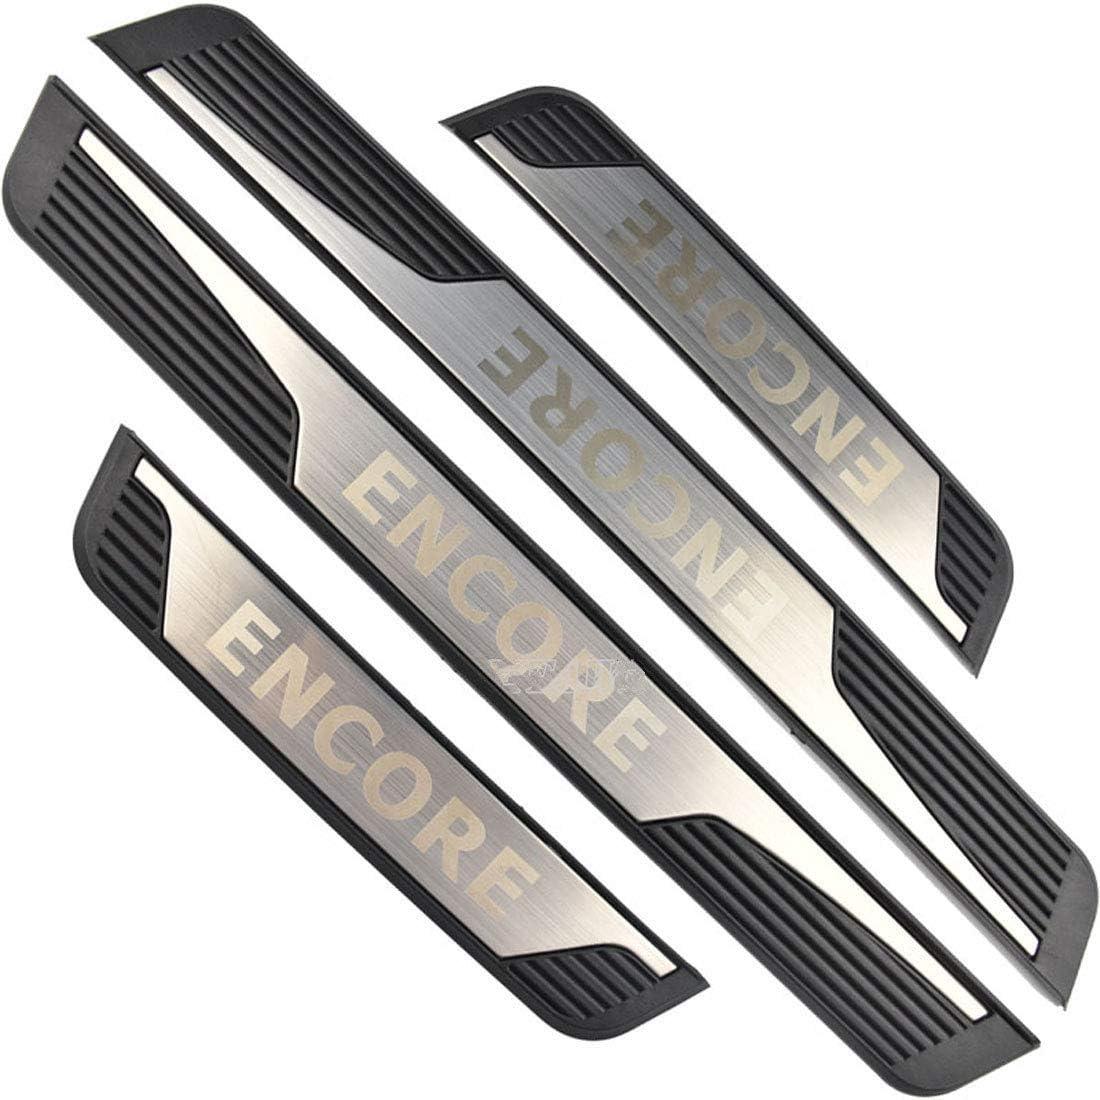 Black For Buick Encore Accessories 2013-2018 Steel Door Sill Scuff Plate Door Sill Protector Guard Cover Trim 4pcs